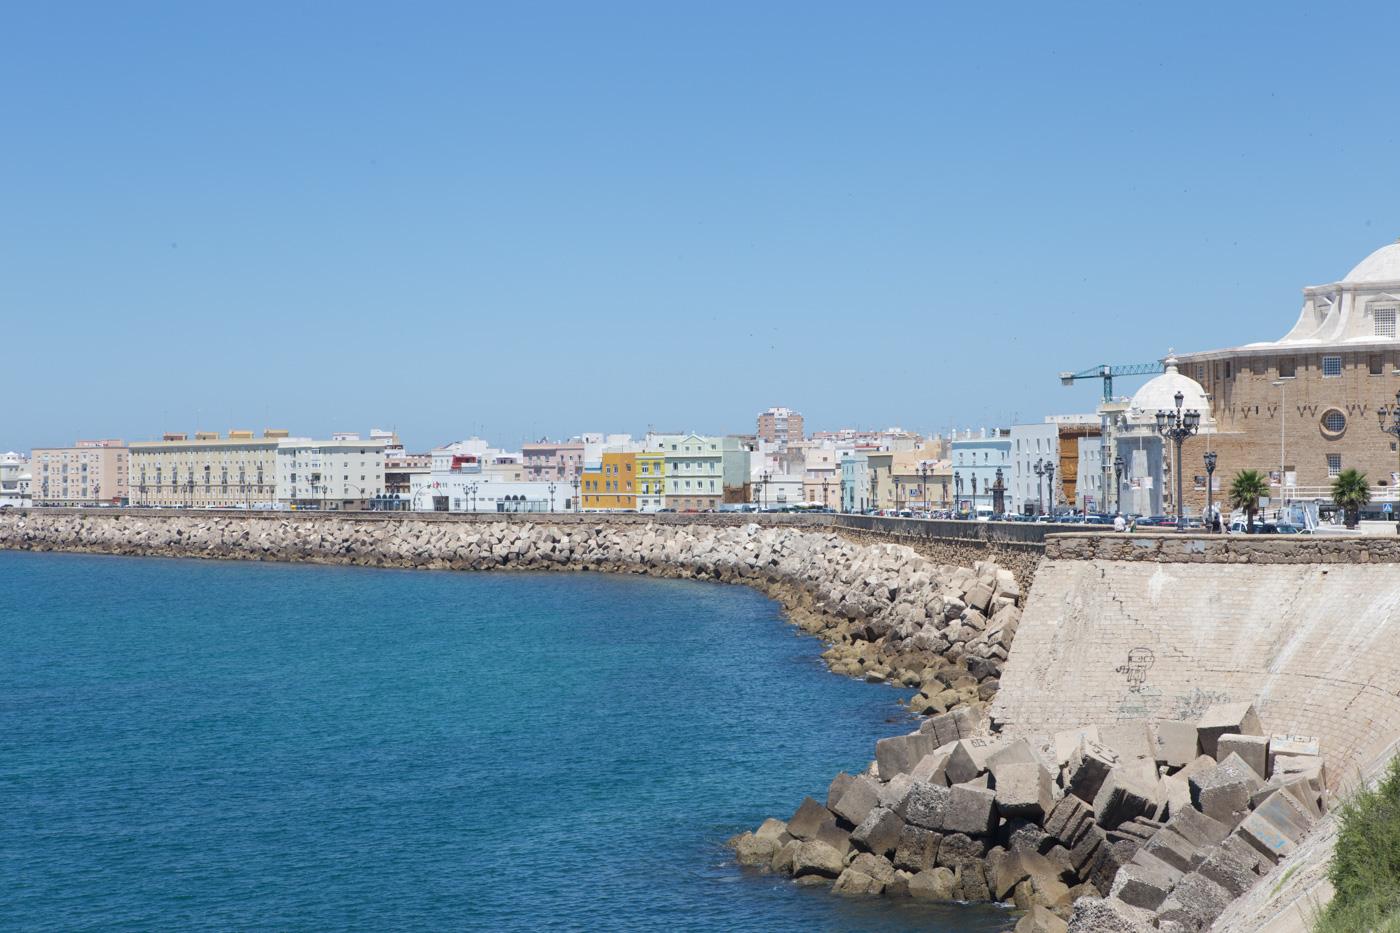 The picturesque coastline of Cadiz